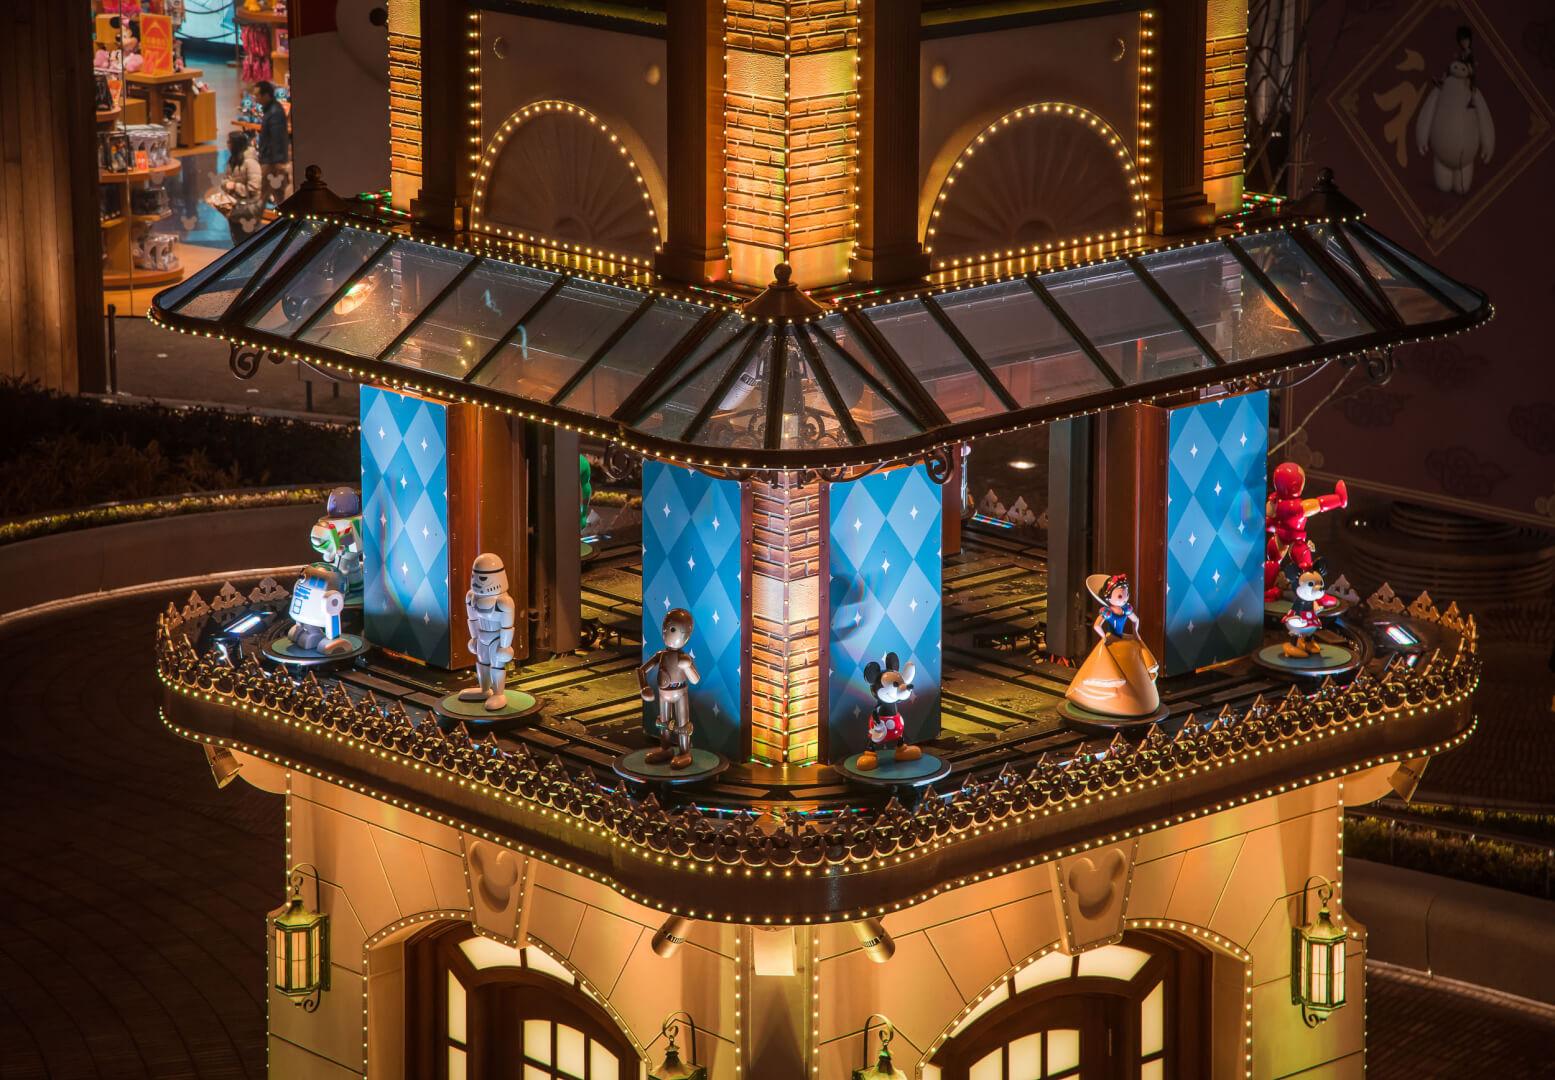 VIDEO: New clock tower debuts at Shanghai Disney Store Plaza | Inside ...